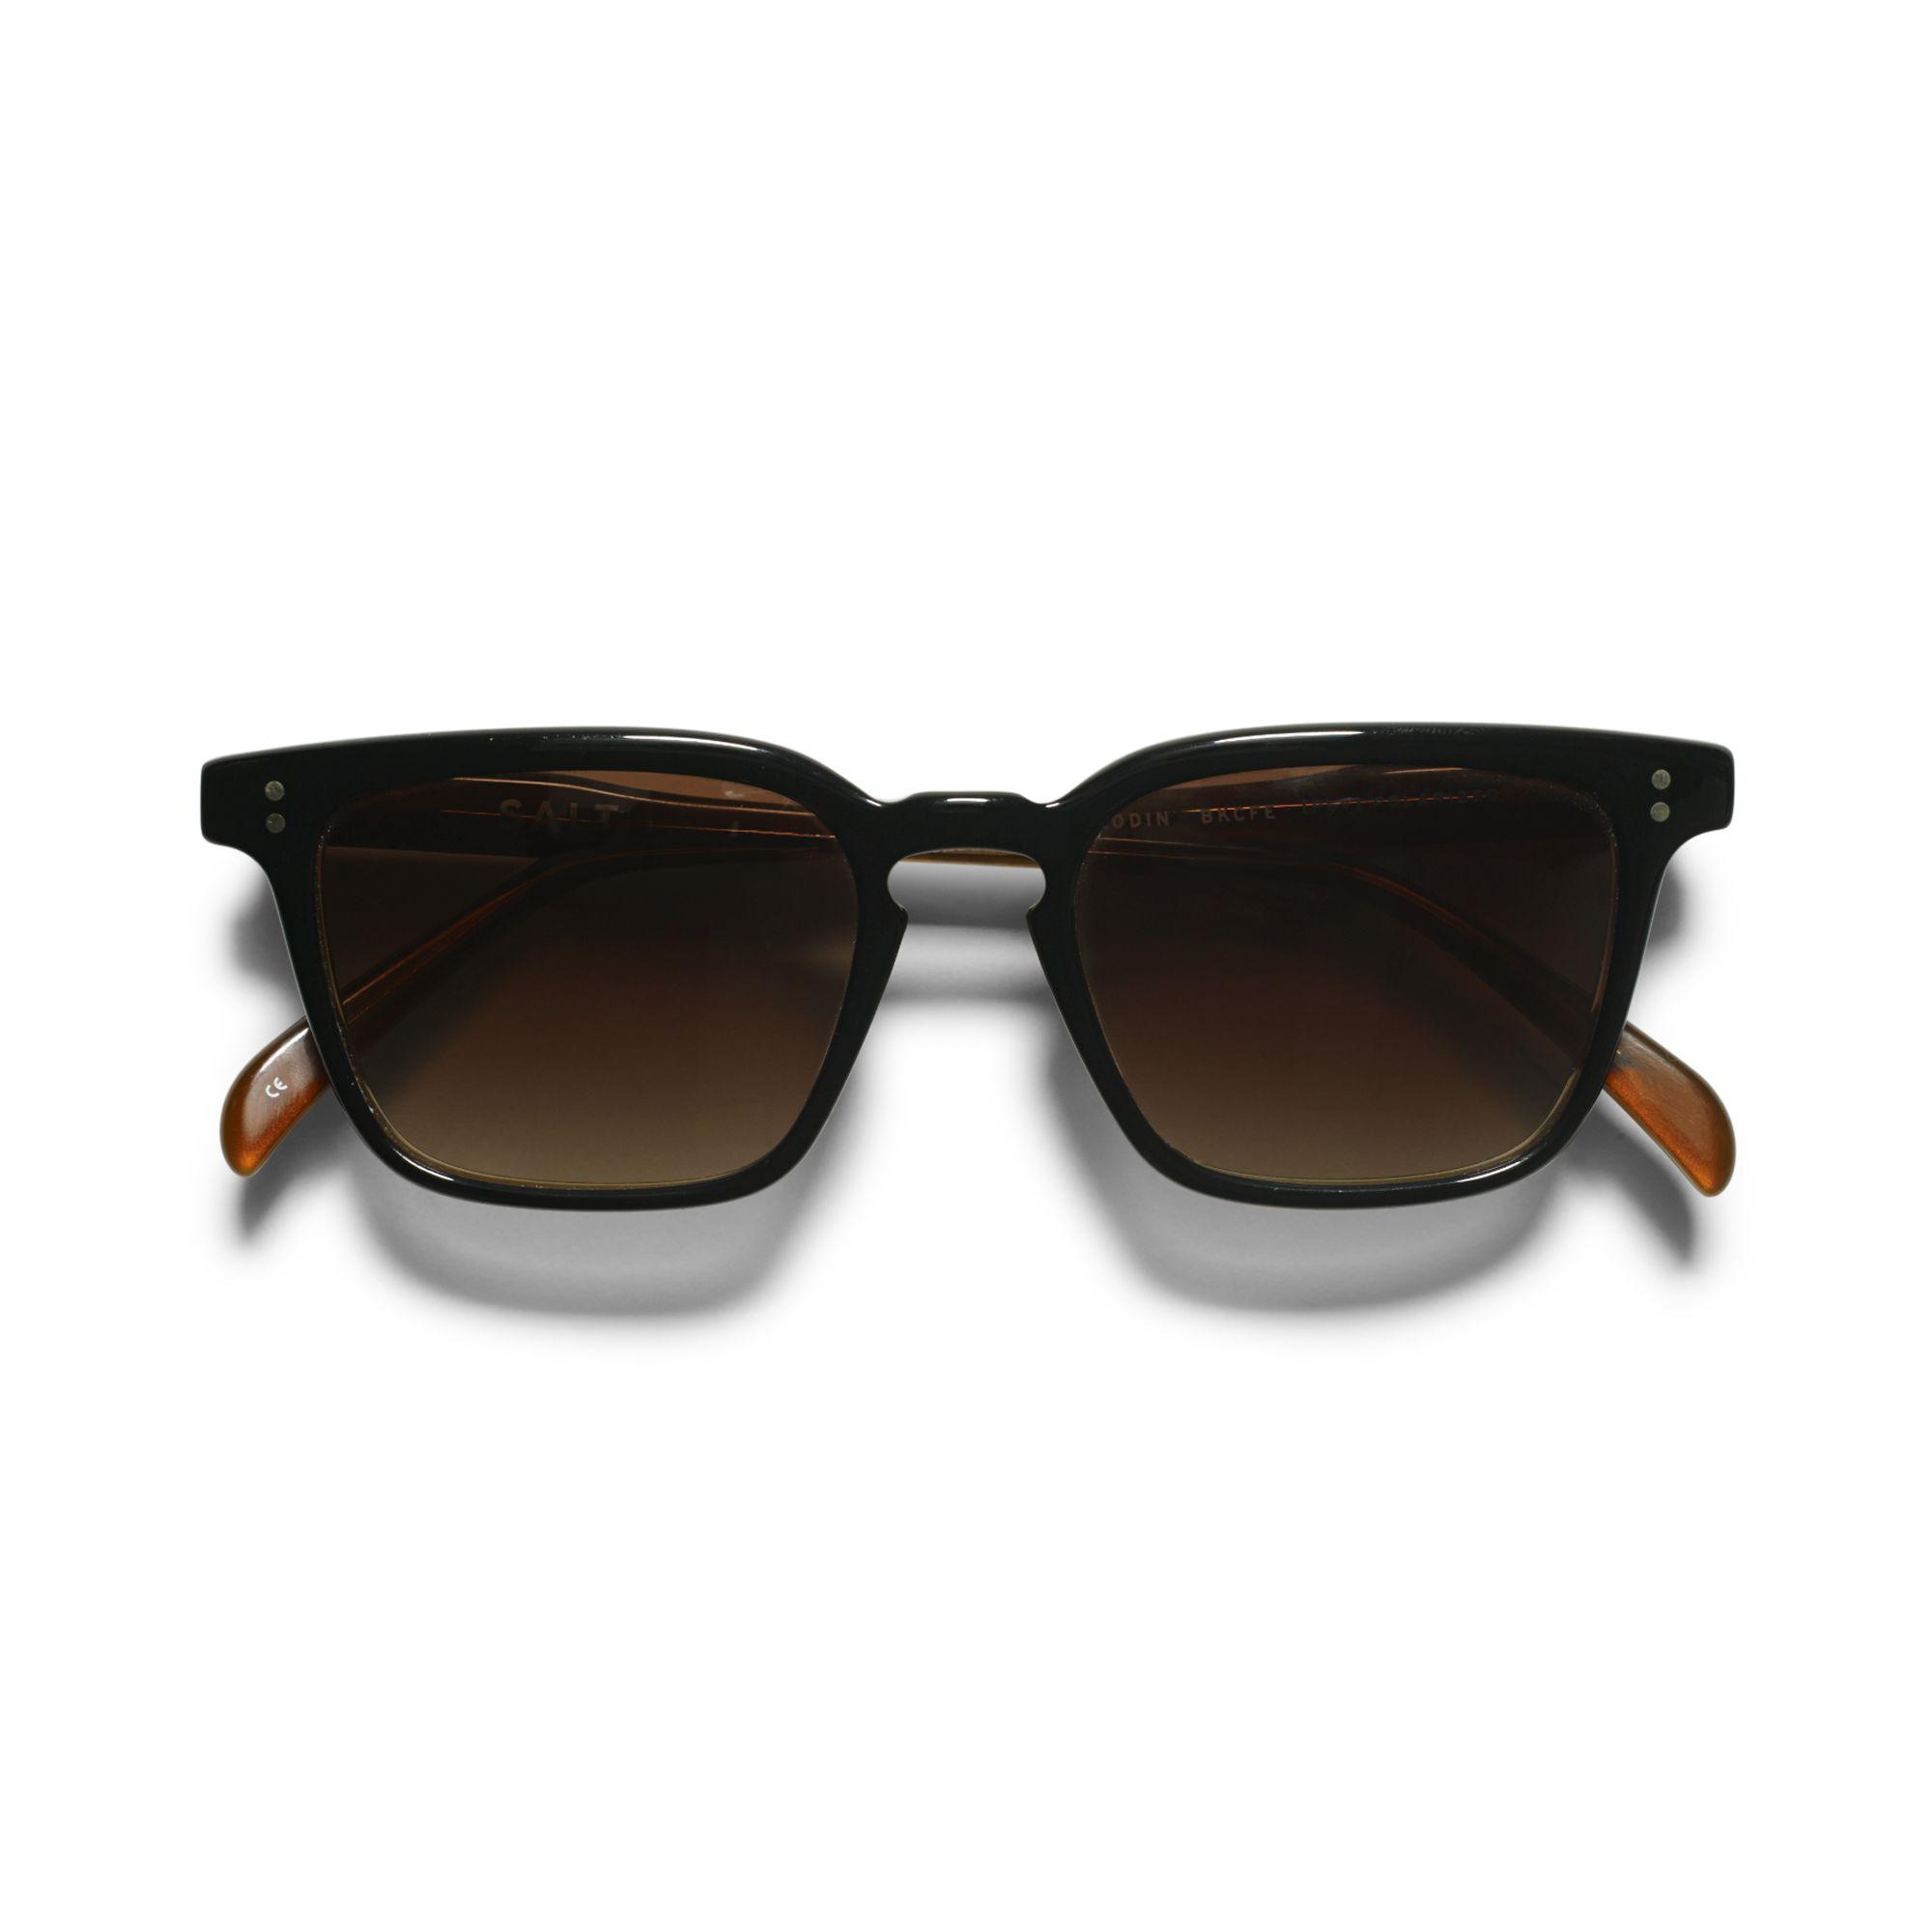 Salt Sunglasses  club monaco salt lodin sunglasses in brown for men lyst